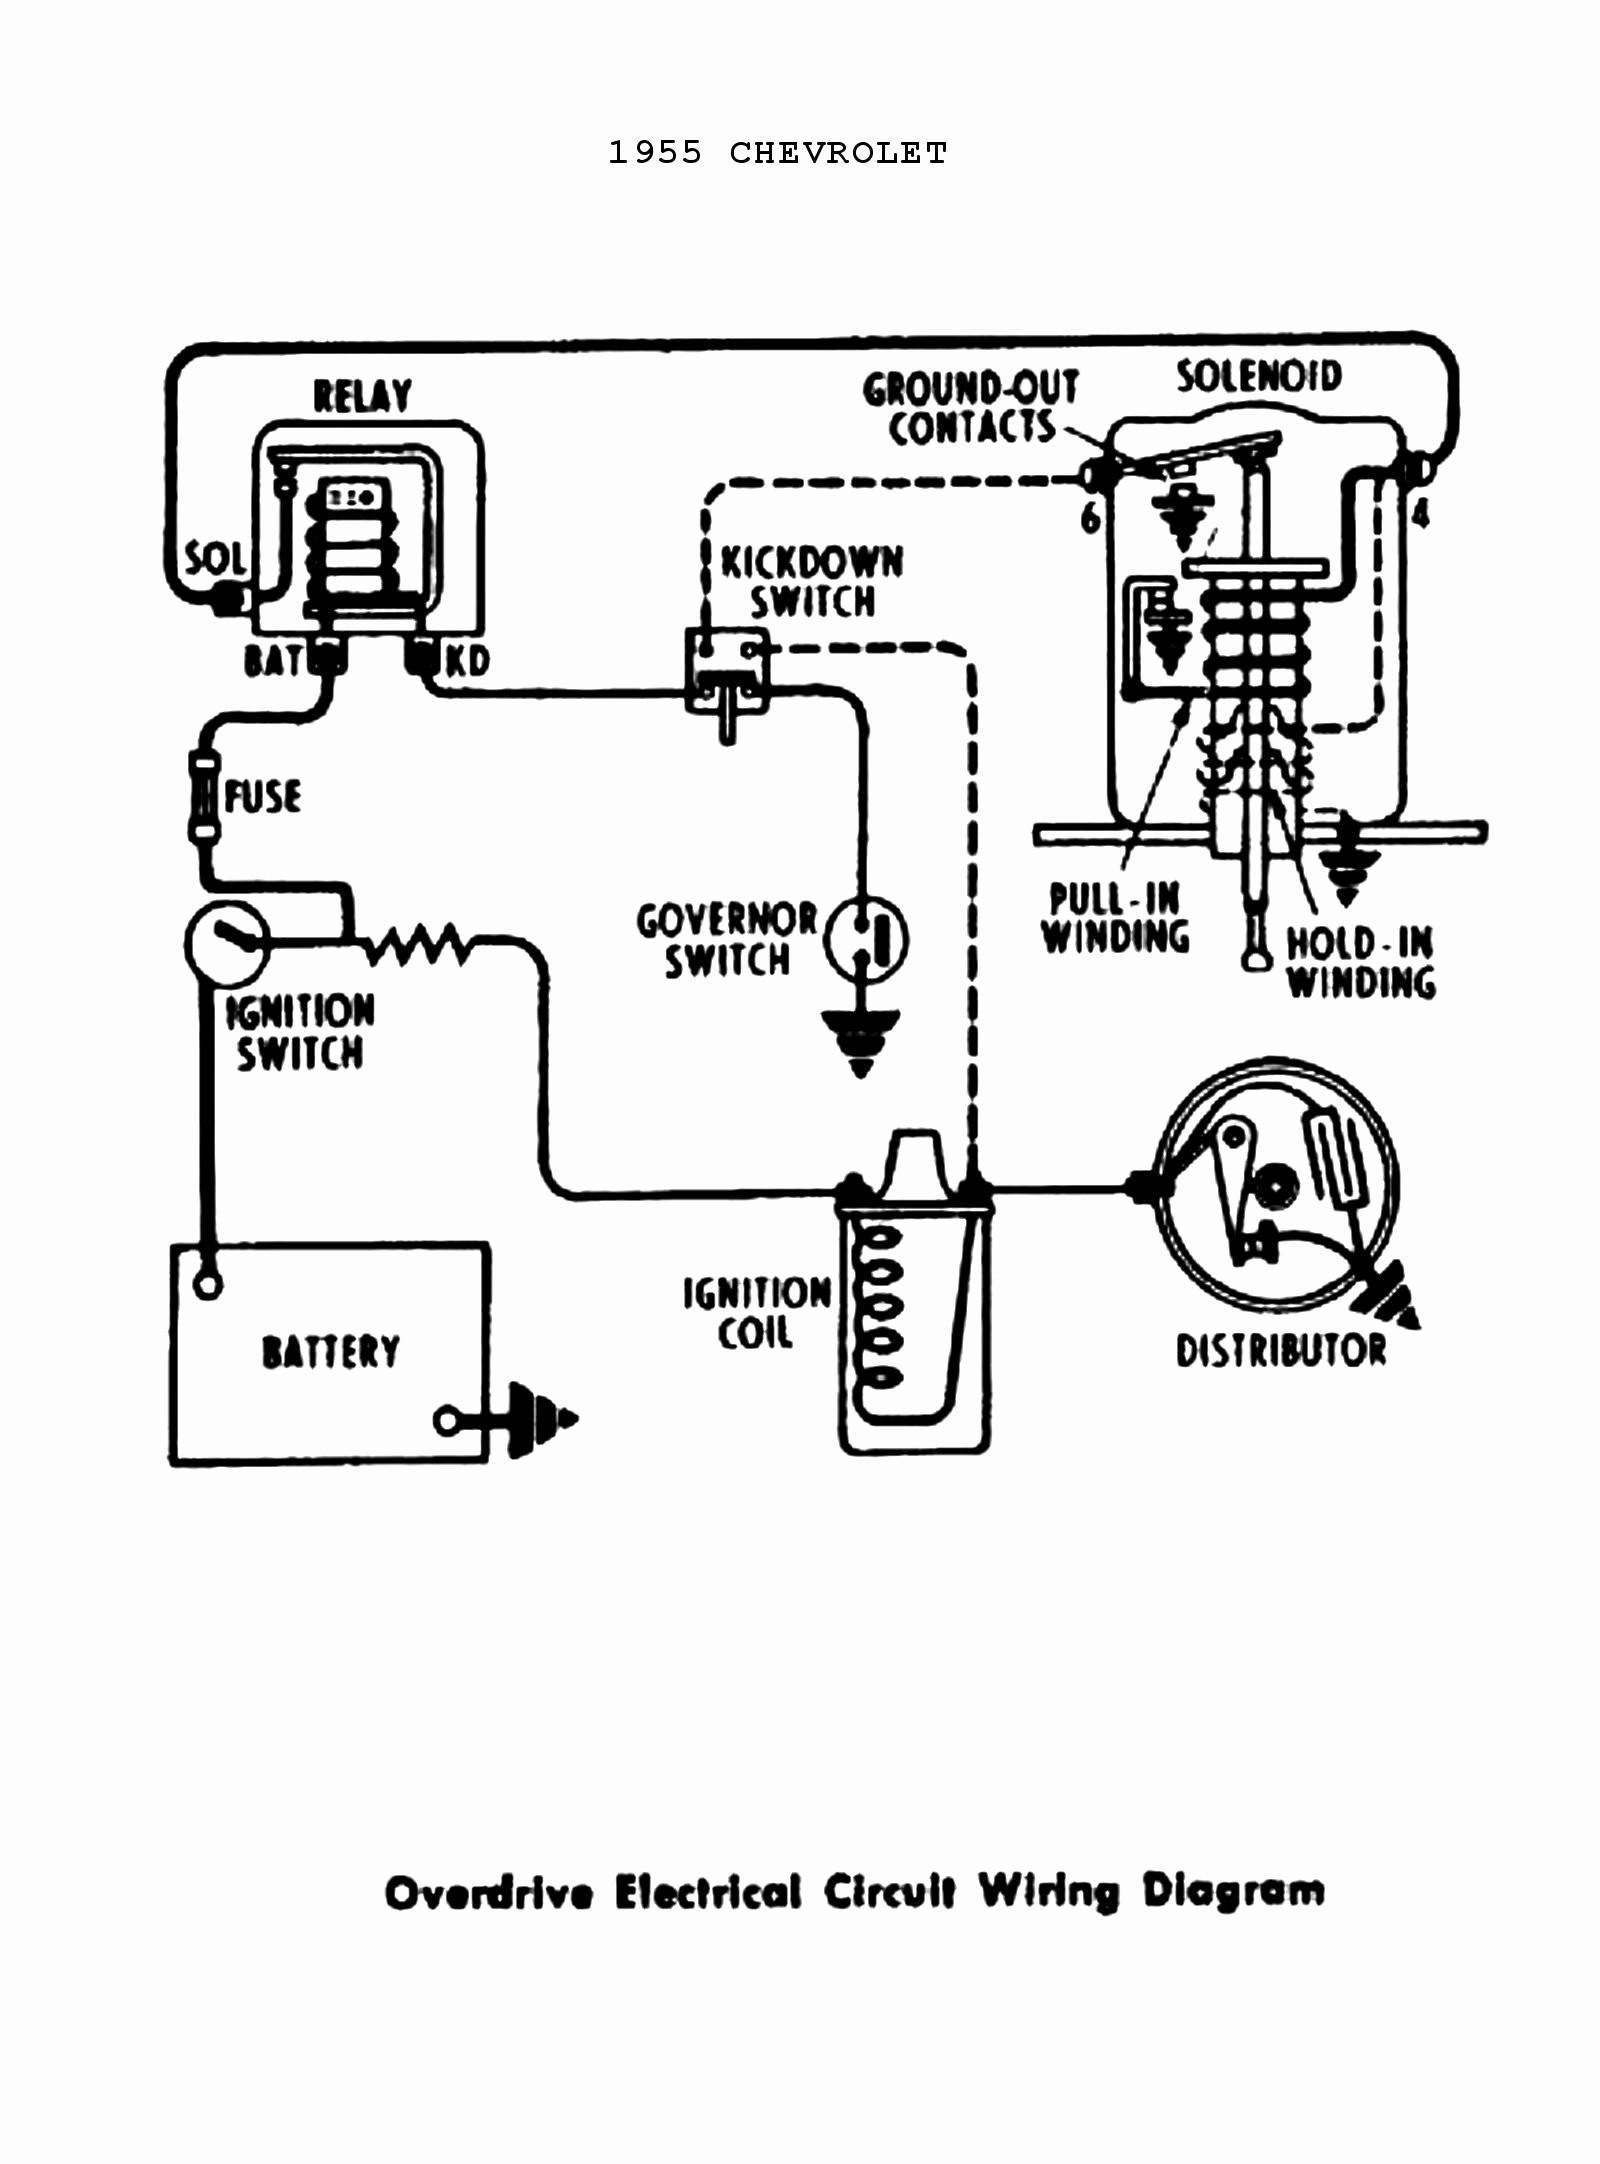 Full Size of Wiring Diagram Ford Starter Solenoid Wiring Diagram Lovely Luxury Gm Starter Solenoid